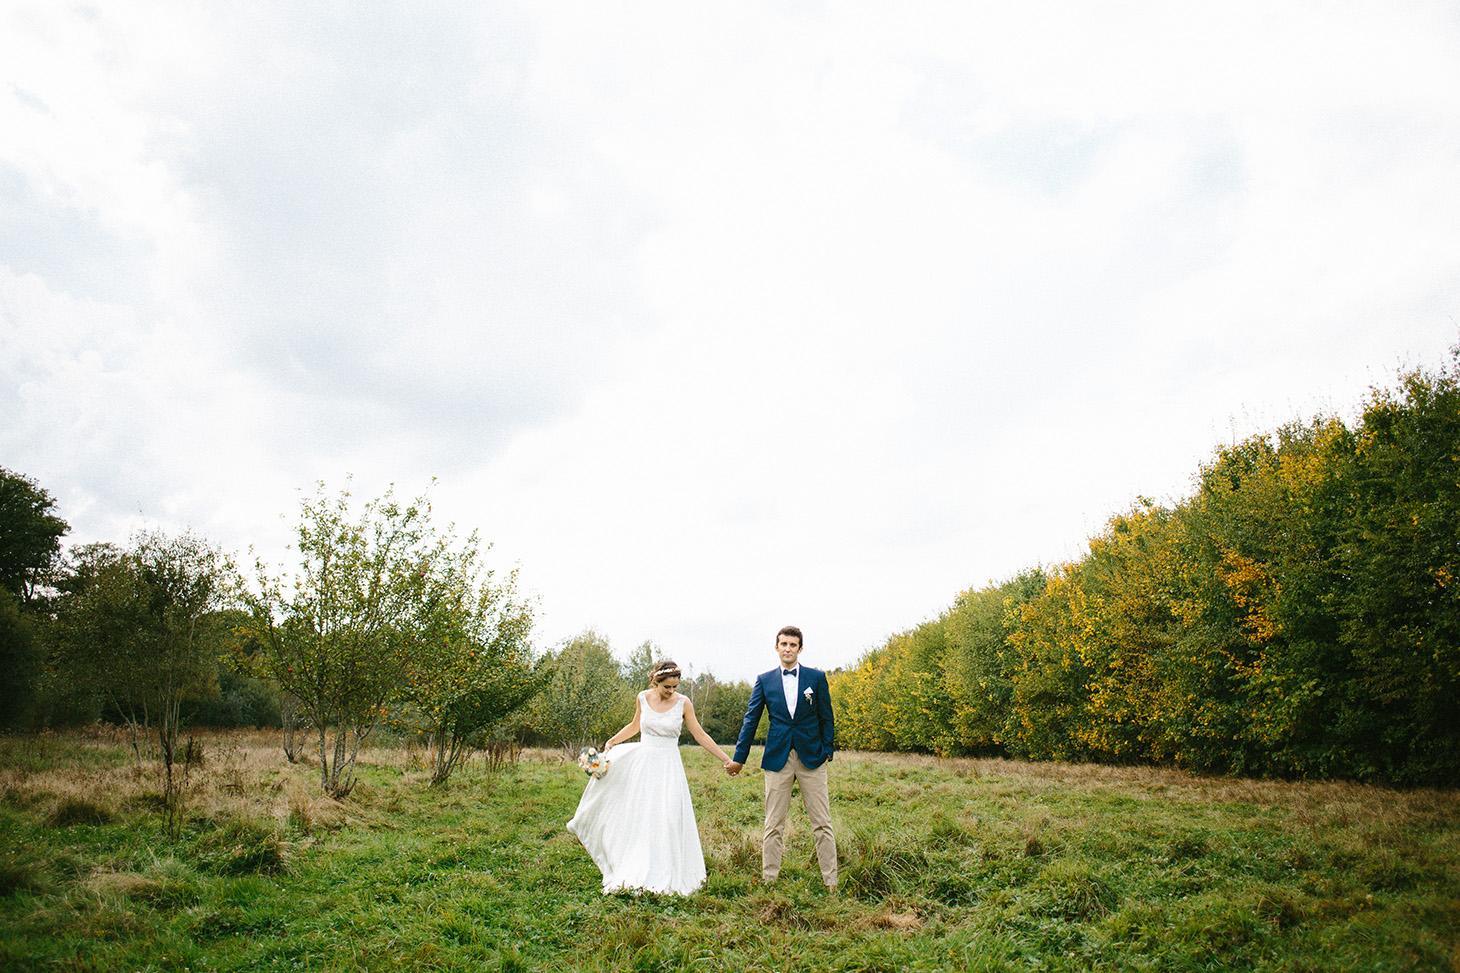 mariage-boheme-manoir-grande-commune-fontainebleau-39